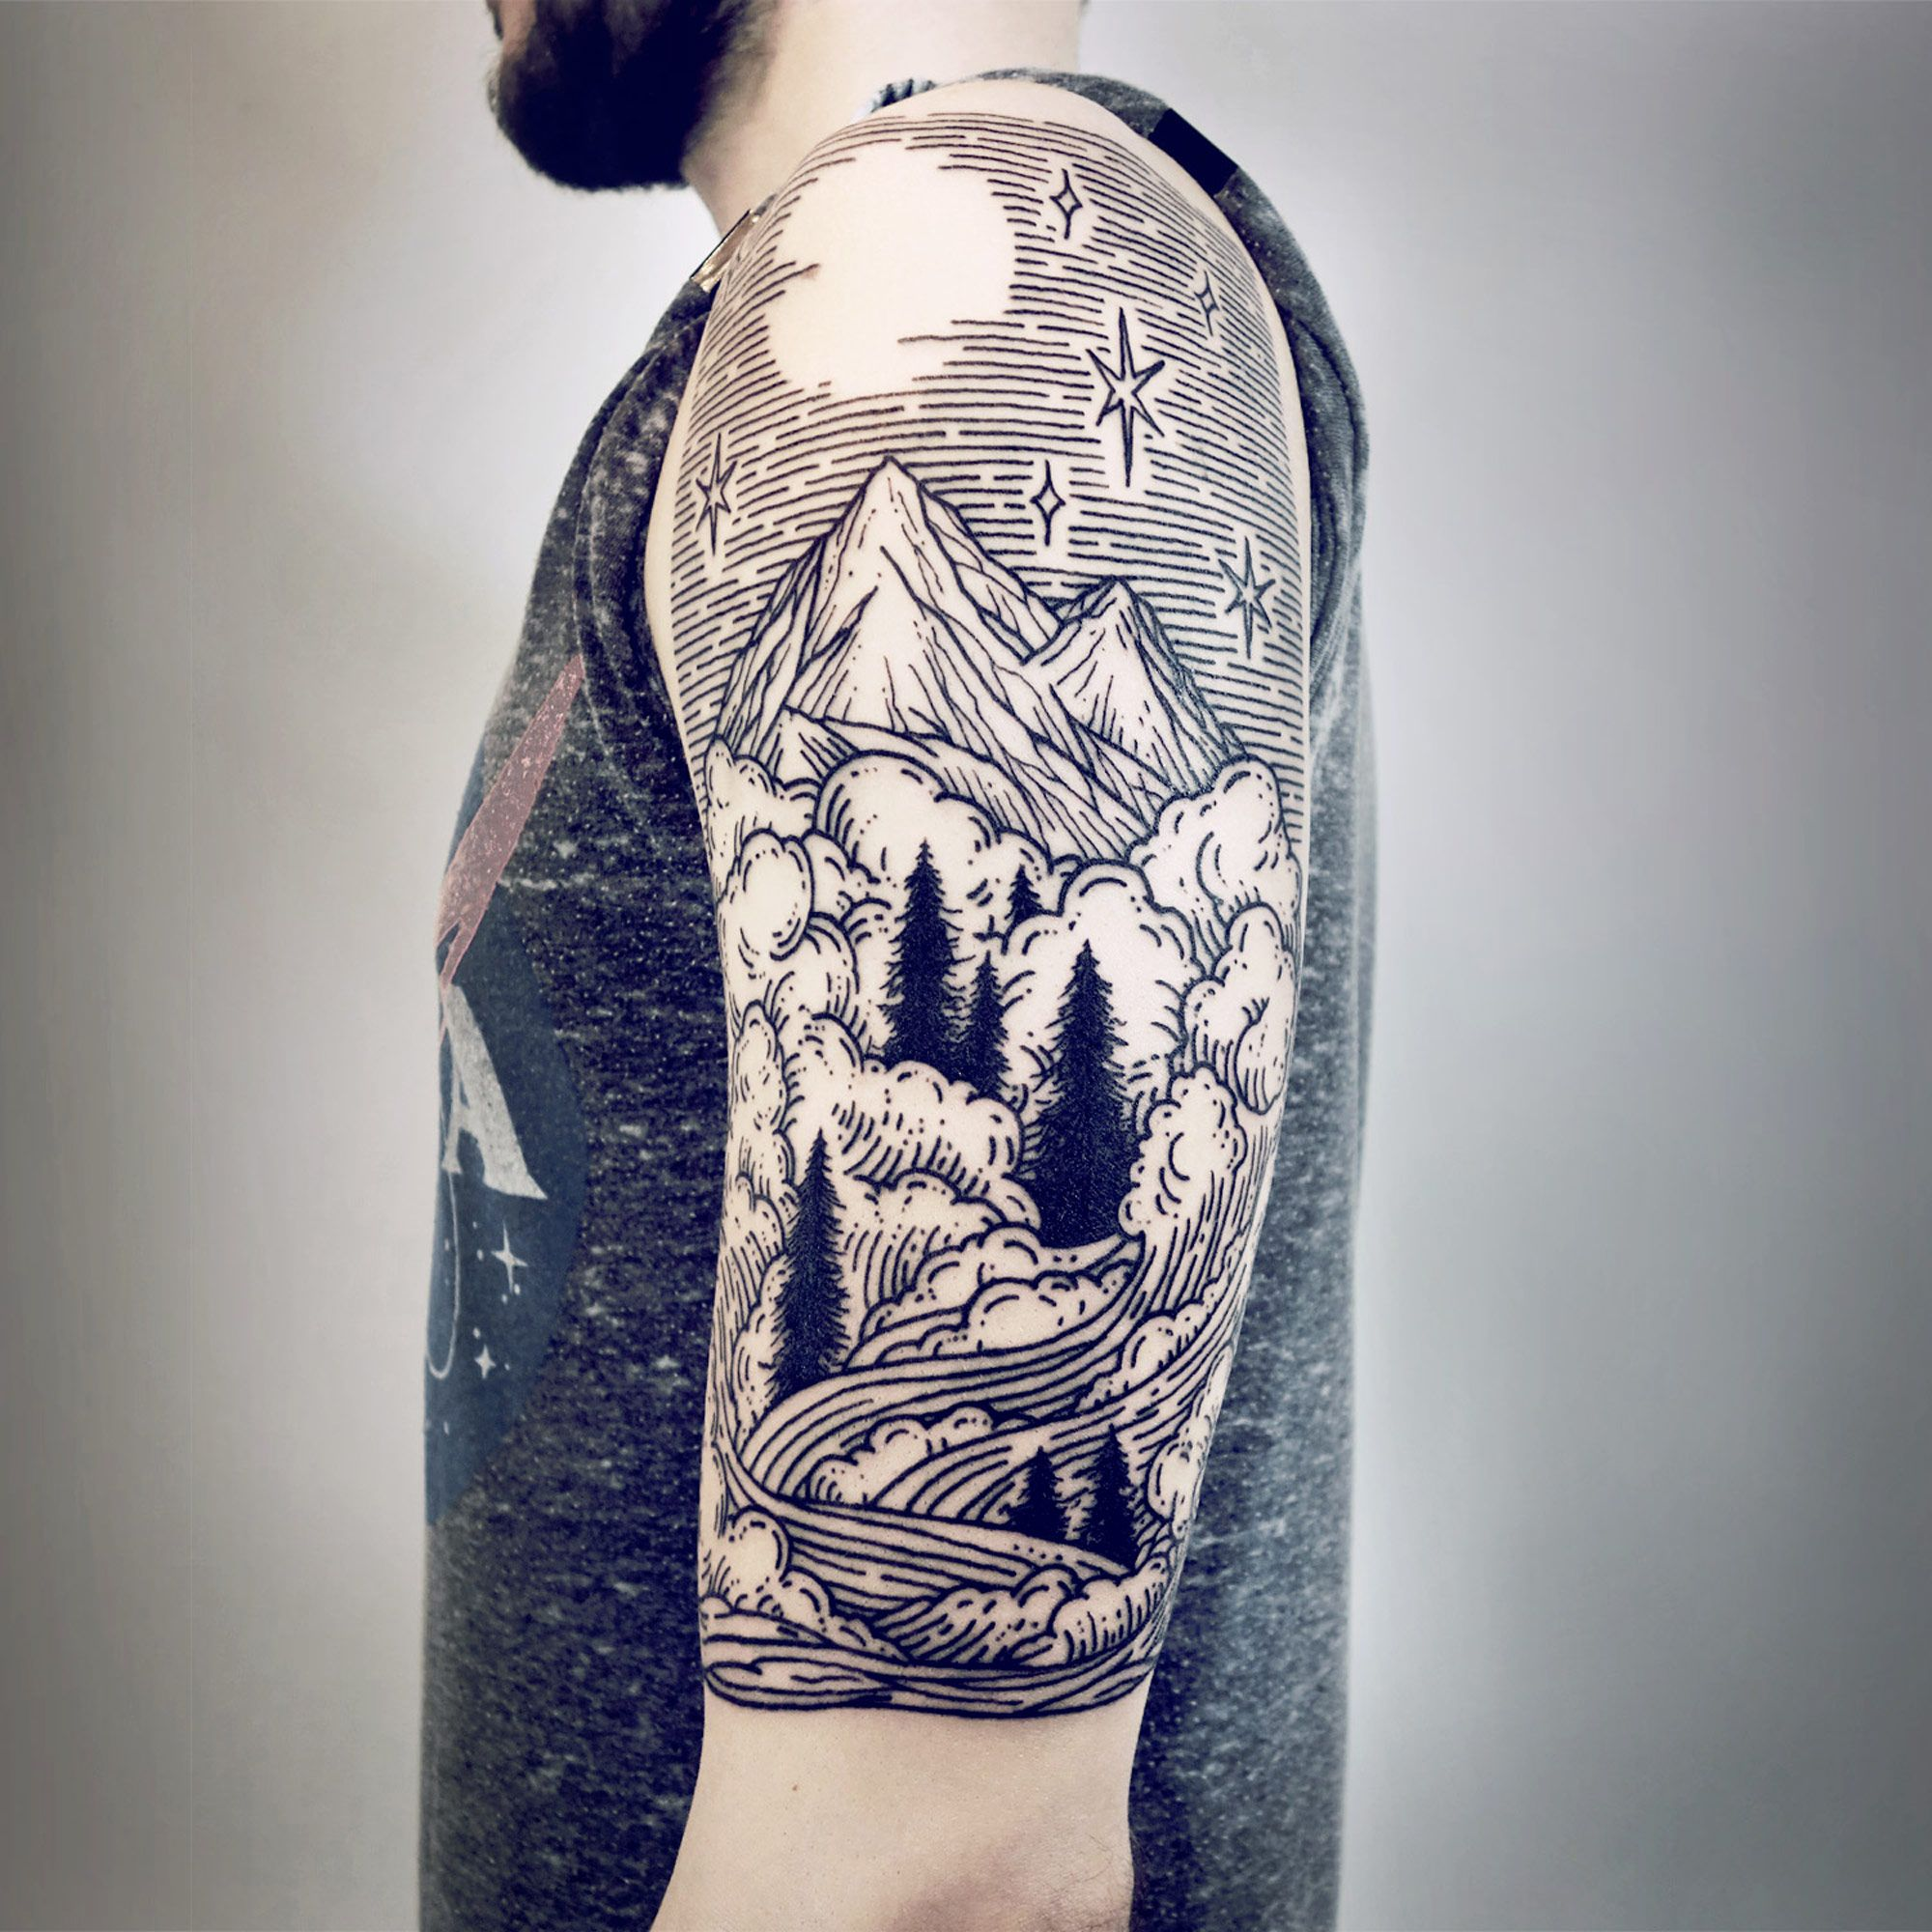 Imaginative Half Sleeve Landscape Tattoos By Lisa Orth Quarter Sleeve Tattoos Half Sleeve Tattoo Woodcut Tattoo